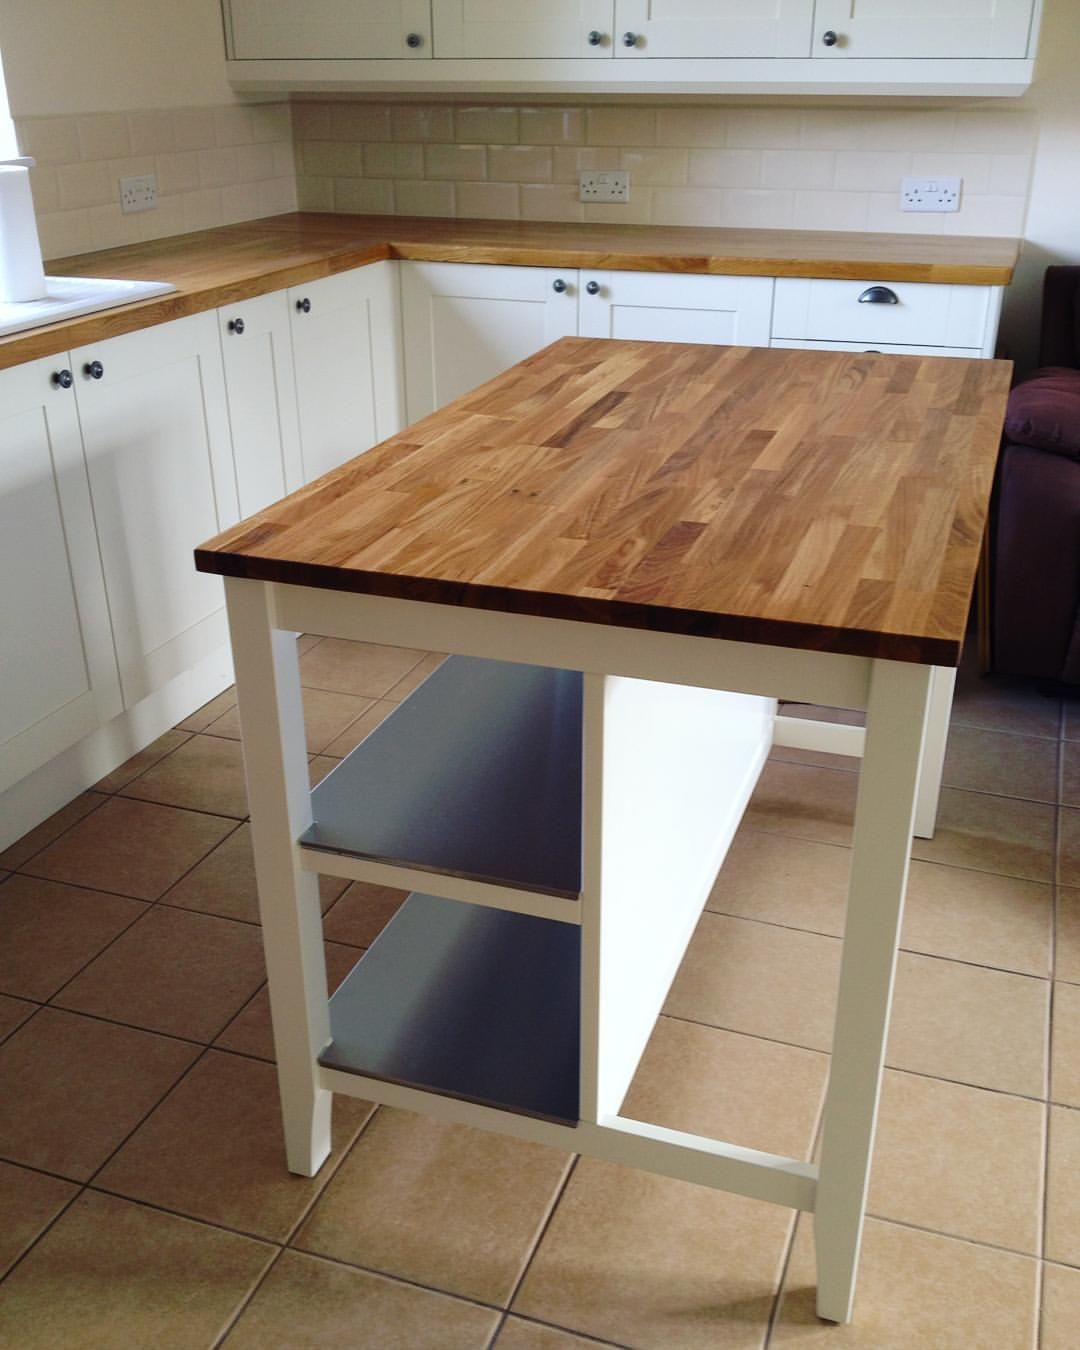 Kitchen Island Ikea Decor: 50+ Clever Kitchen Island Design Decorating Ideas